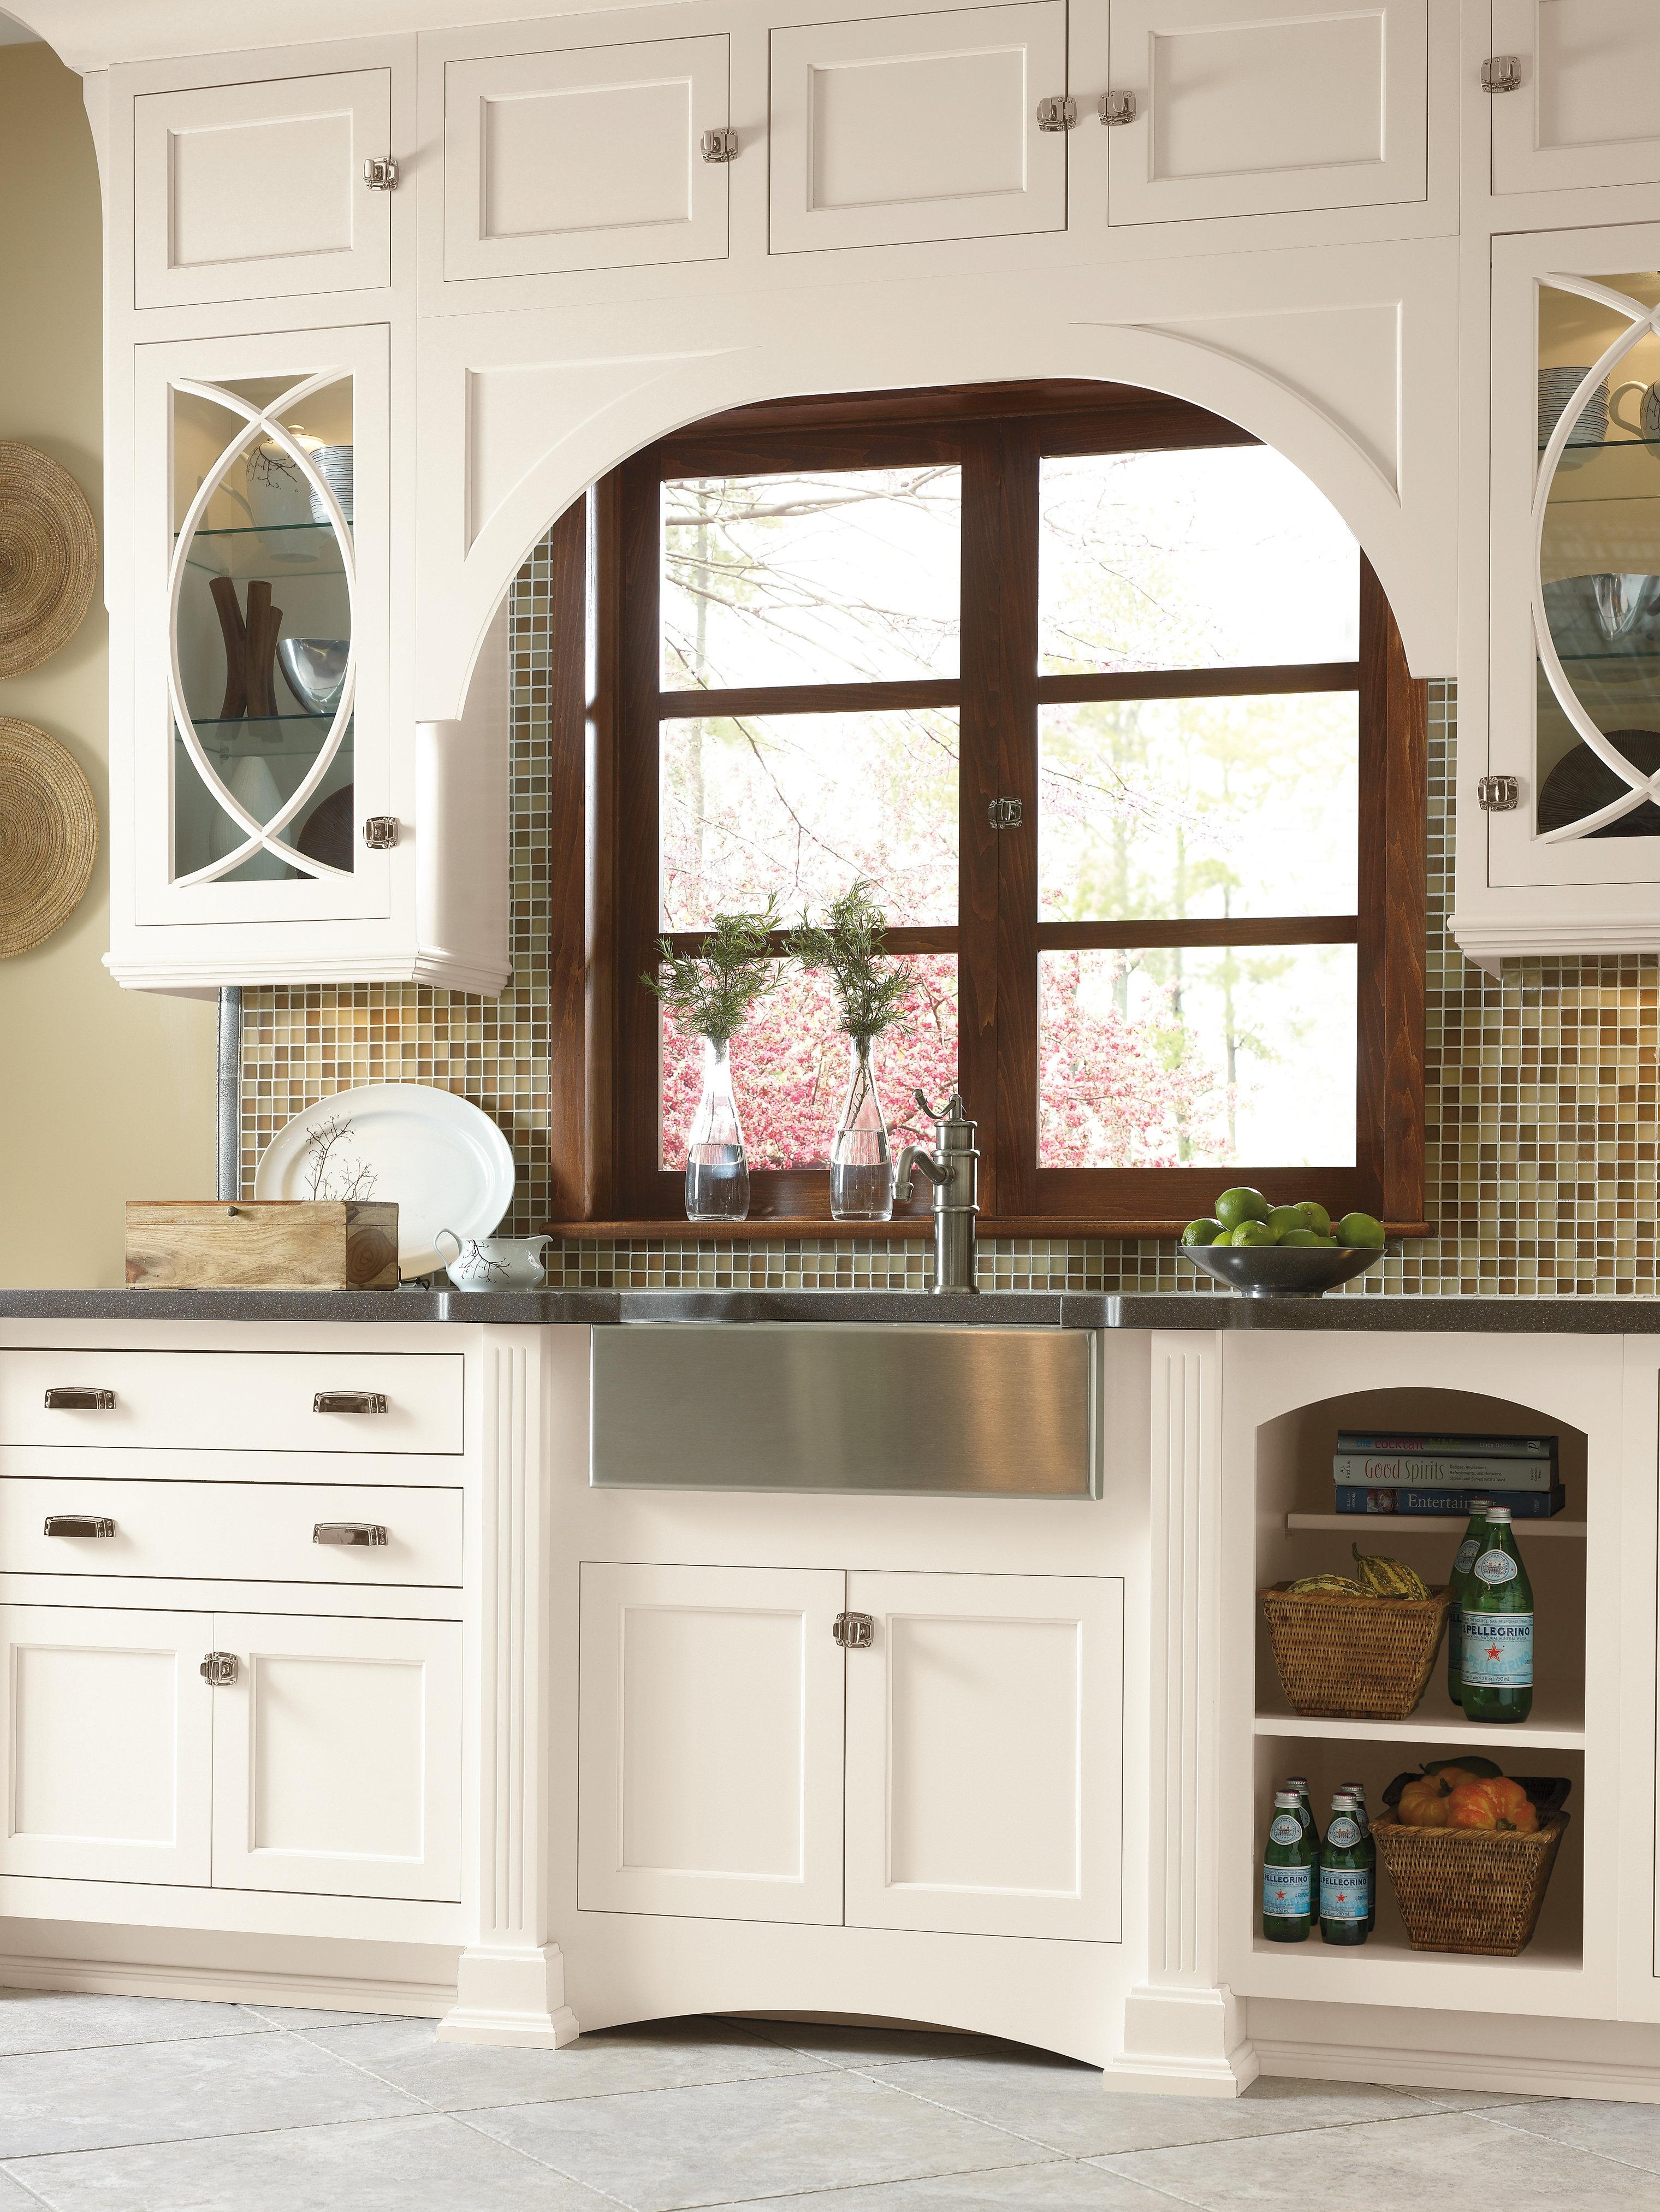 lightbox image 1flx select kitchen design Select Cabinetry Cabinetry Cedar Falls Kitchen Design Cedar Falls contemporary farmhouse white